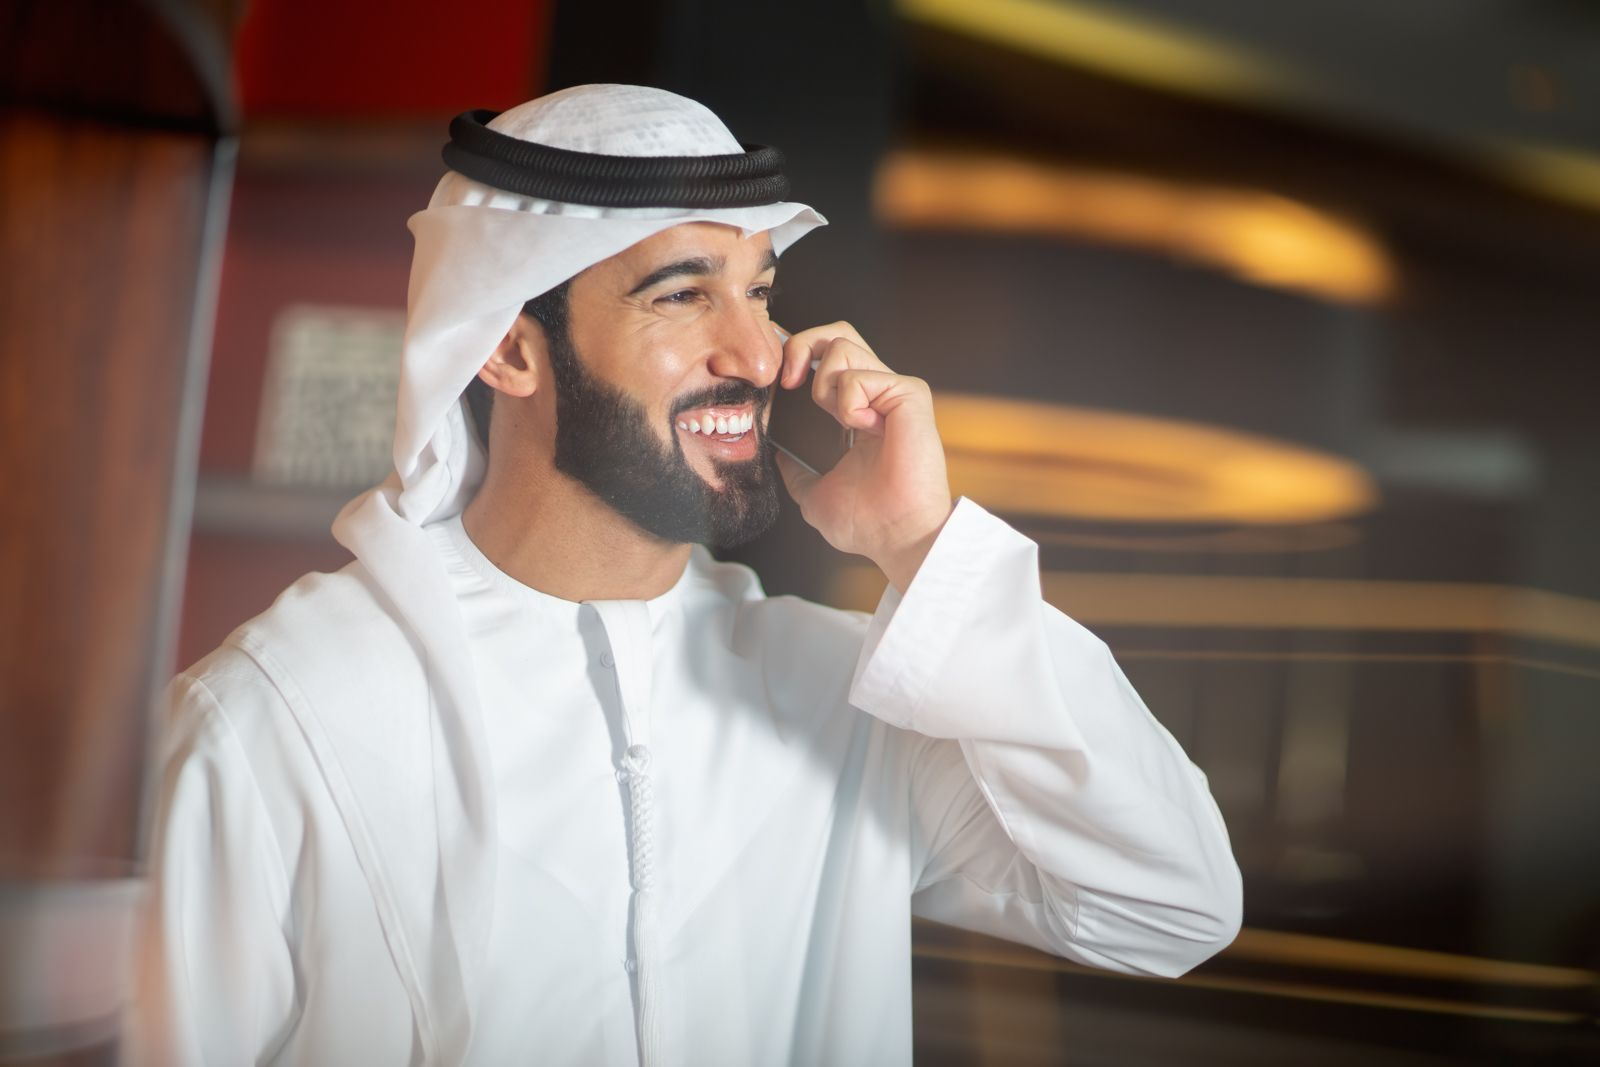 Abu Dhabi Lifestyle Photographer, Dubai Lifestyle Photographer, Saudi Arabia Advertising Photographer, Saudi Arabia Lifestyle Photographer-8793.jpg